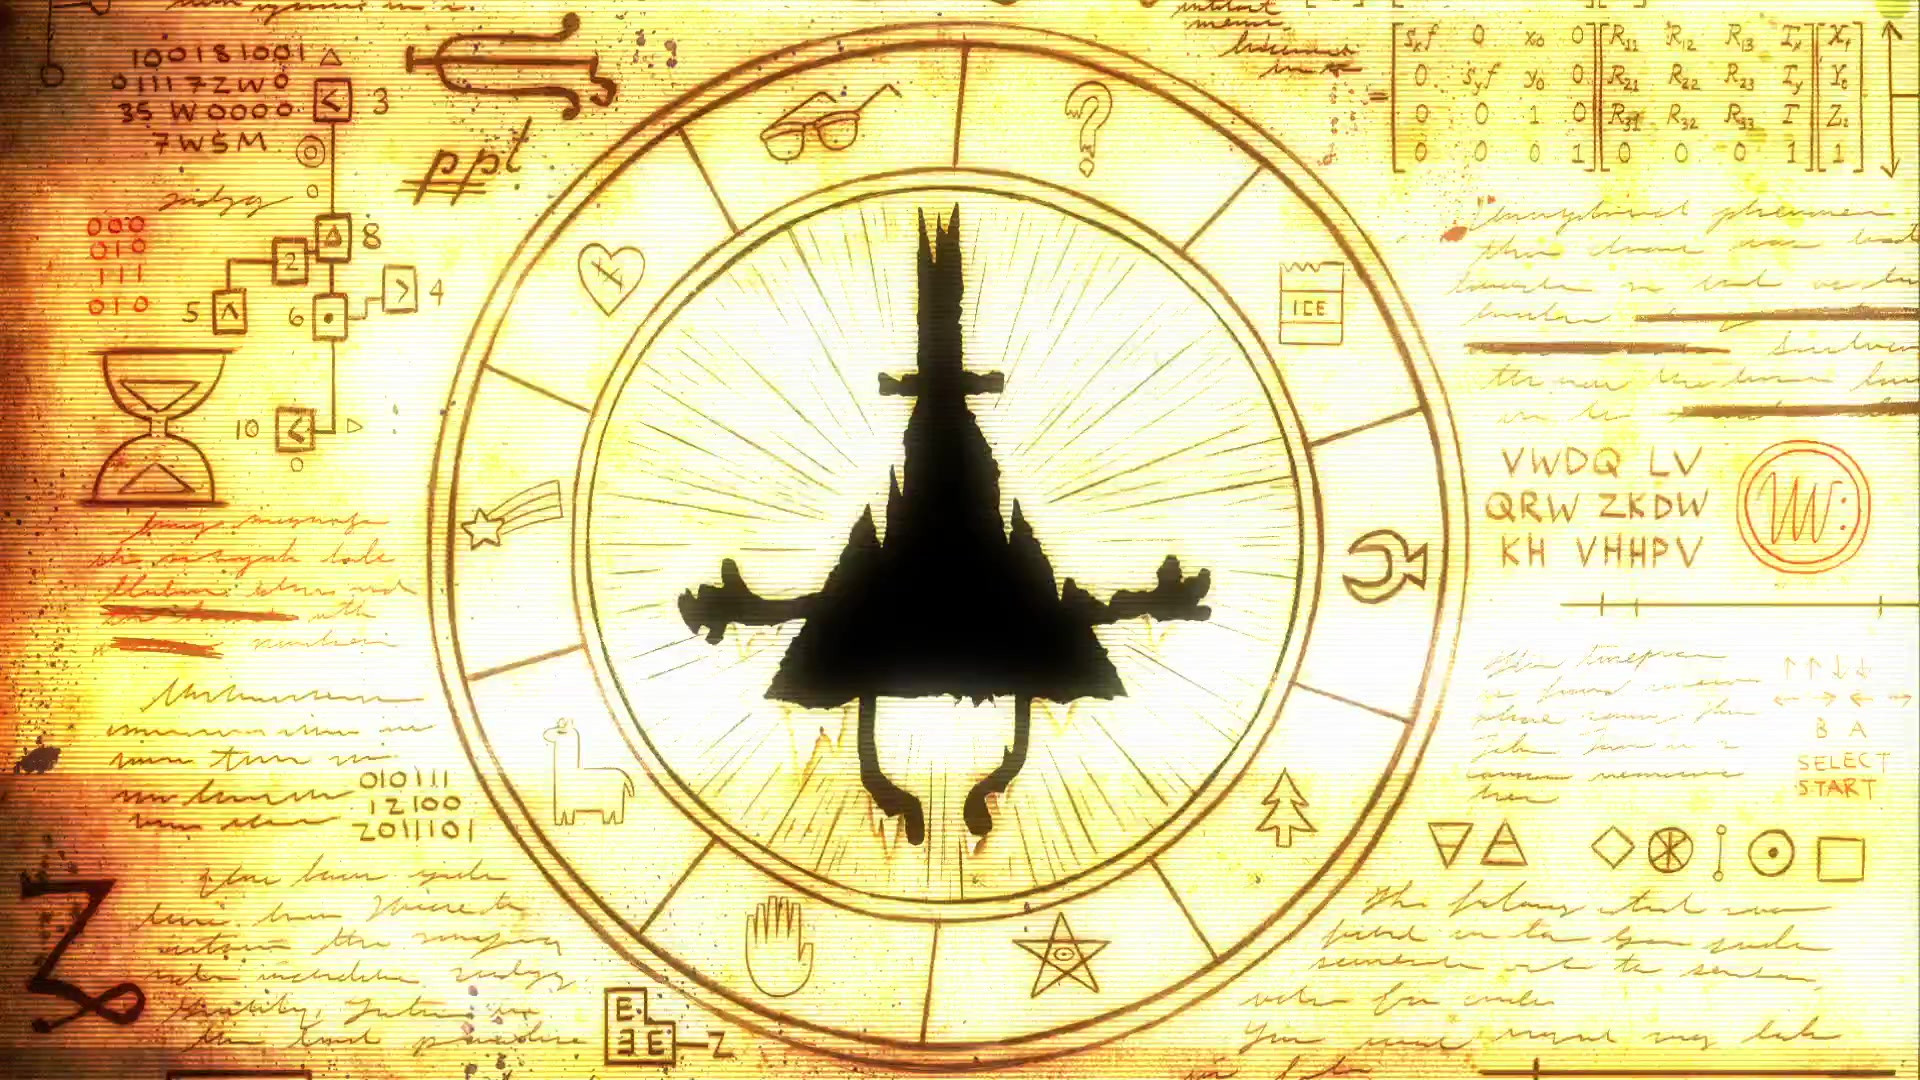 126 Gravity Falls Bill Cipher